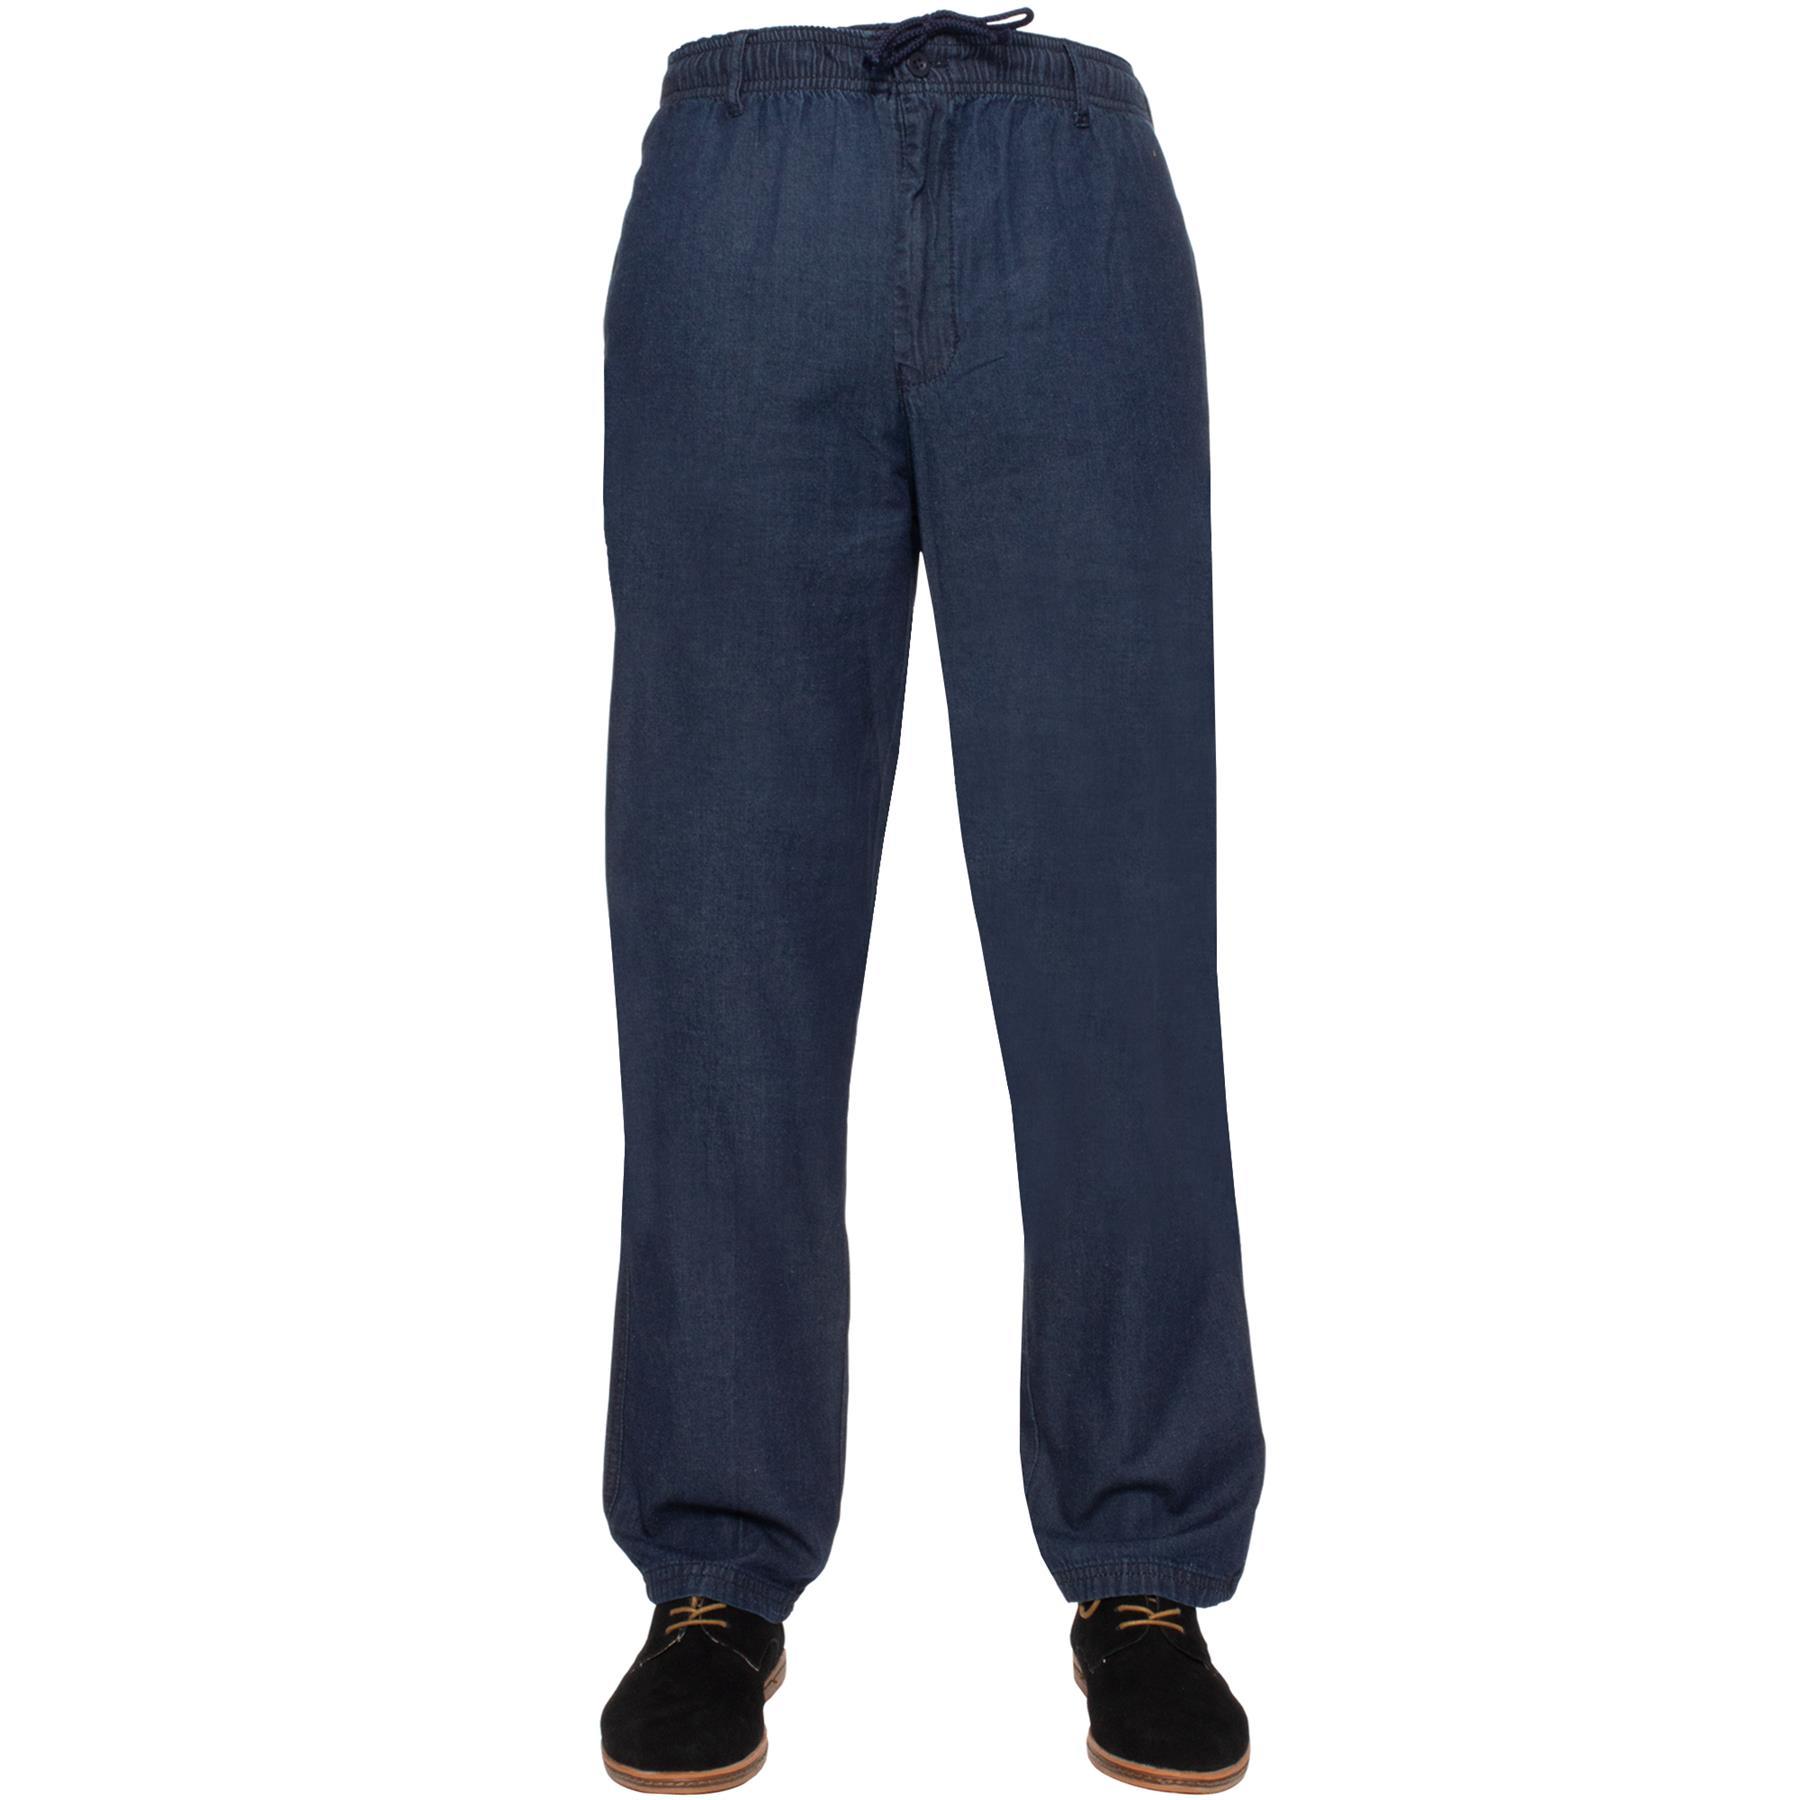 Para-Hombres-Pantalones-De-Rugby-Kruze-cintura-elastica-con-cordon-pantalones-REGULAR-King-Tamanos miniatura 18